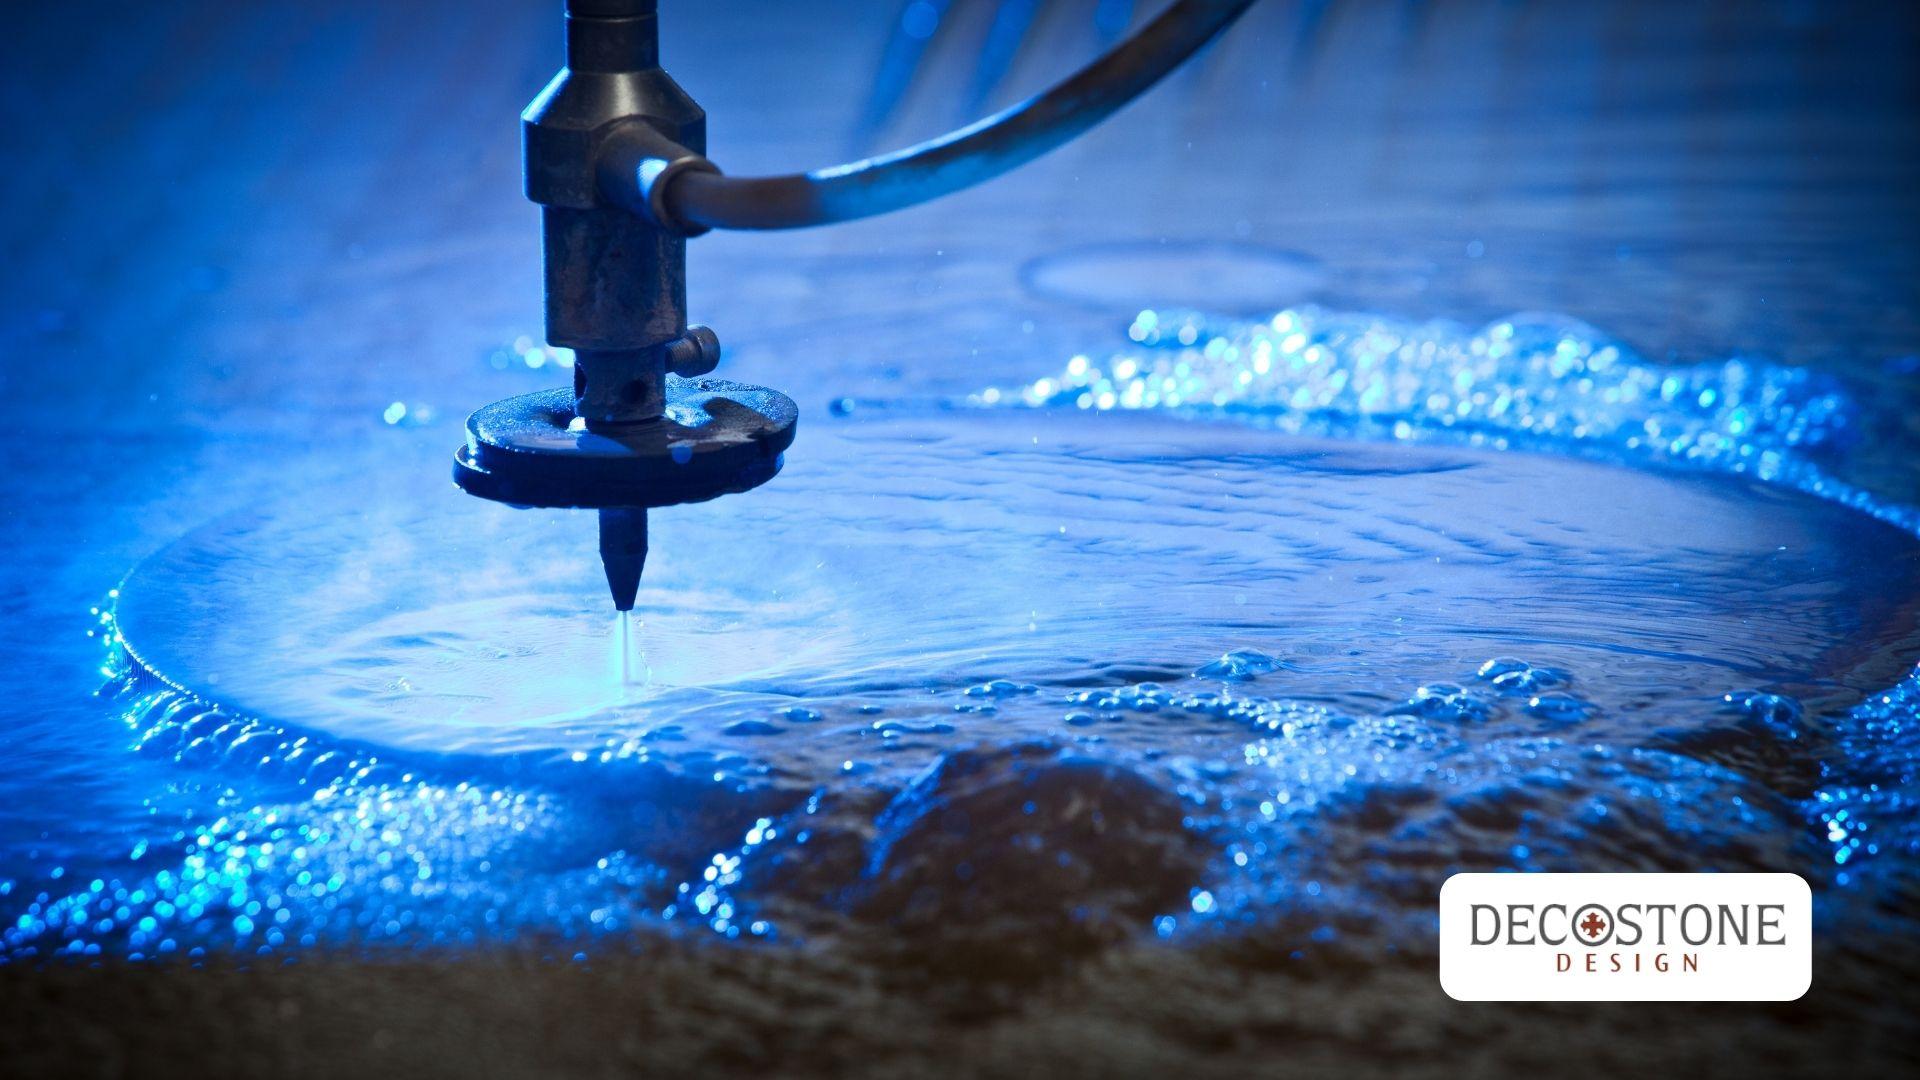 We Have a New Waterjet Machine at Decostone Design!